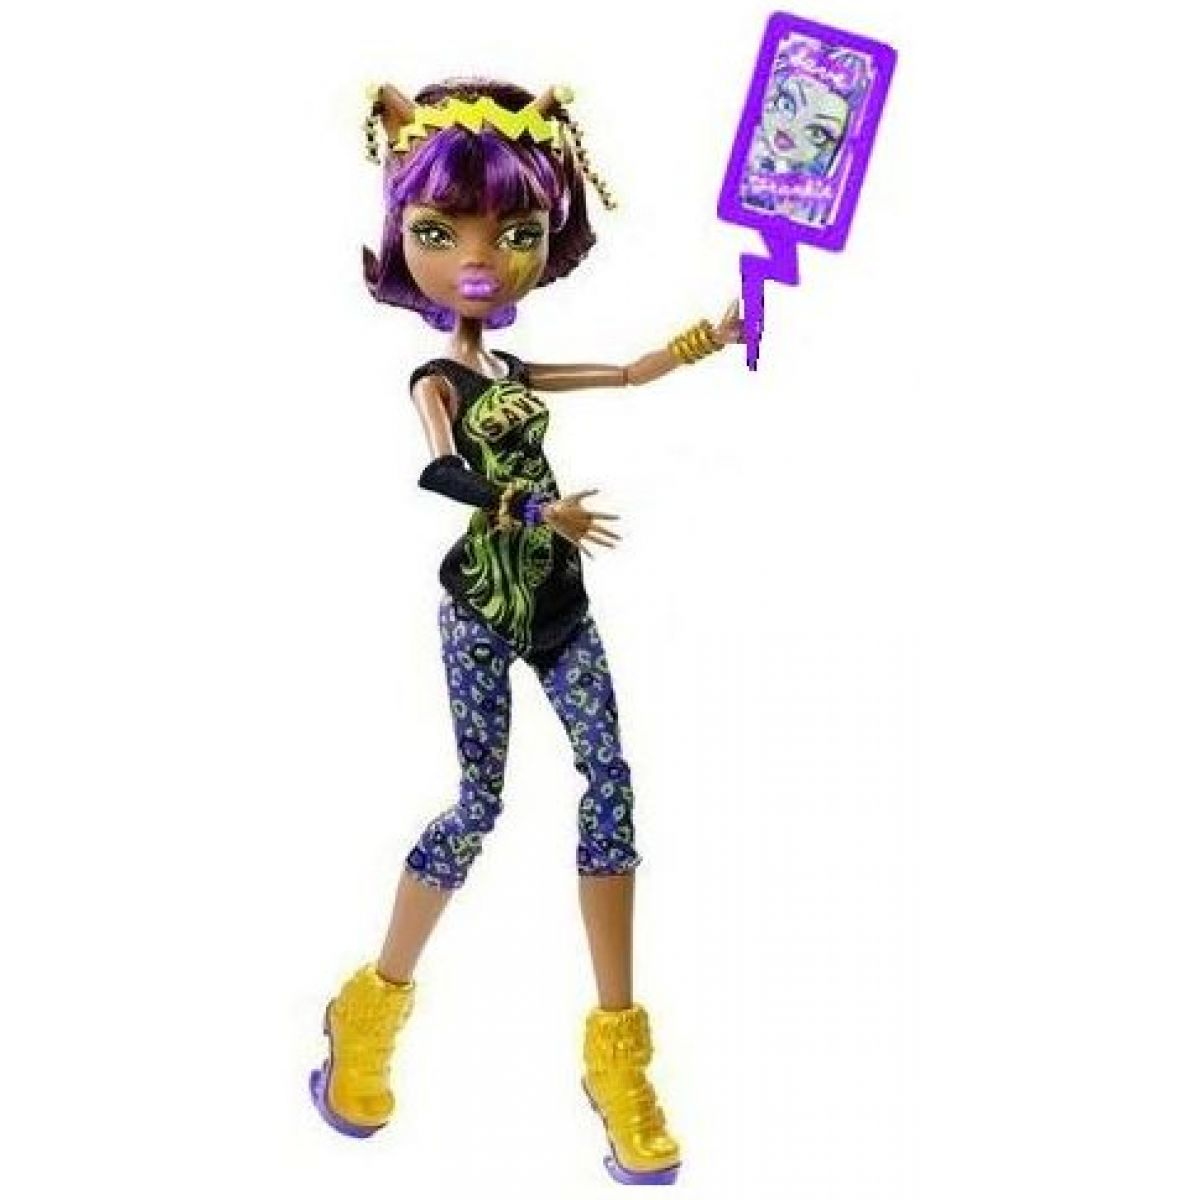 Mattel Monster High Záchranný tým - Clawdeen Wolf